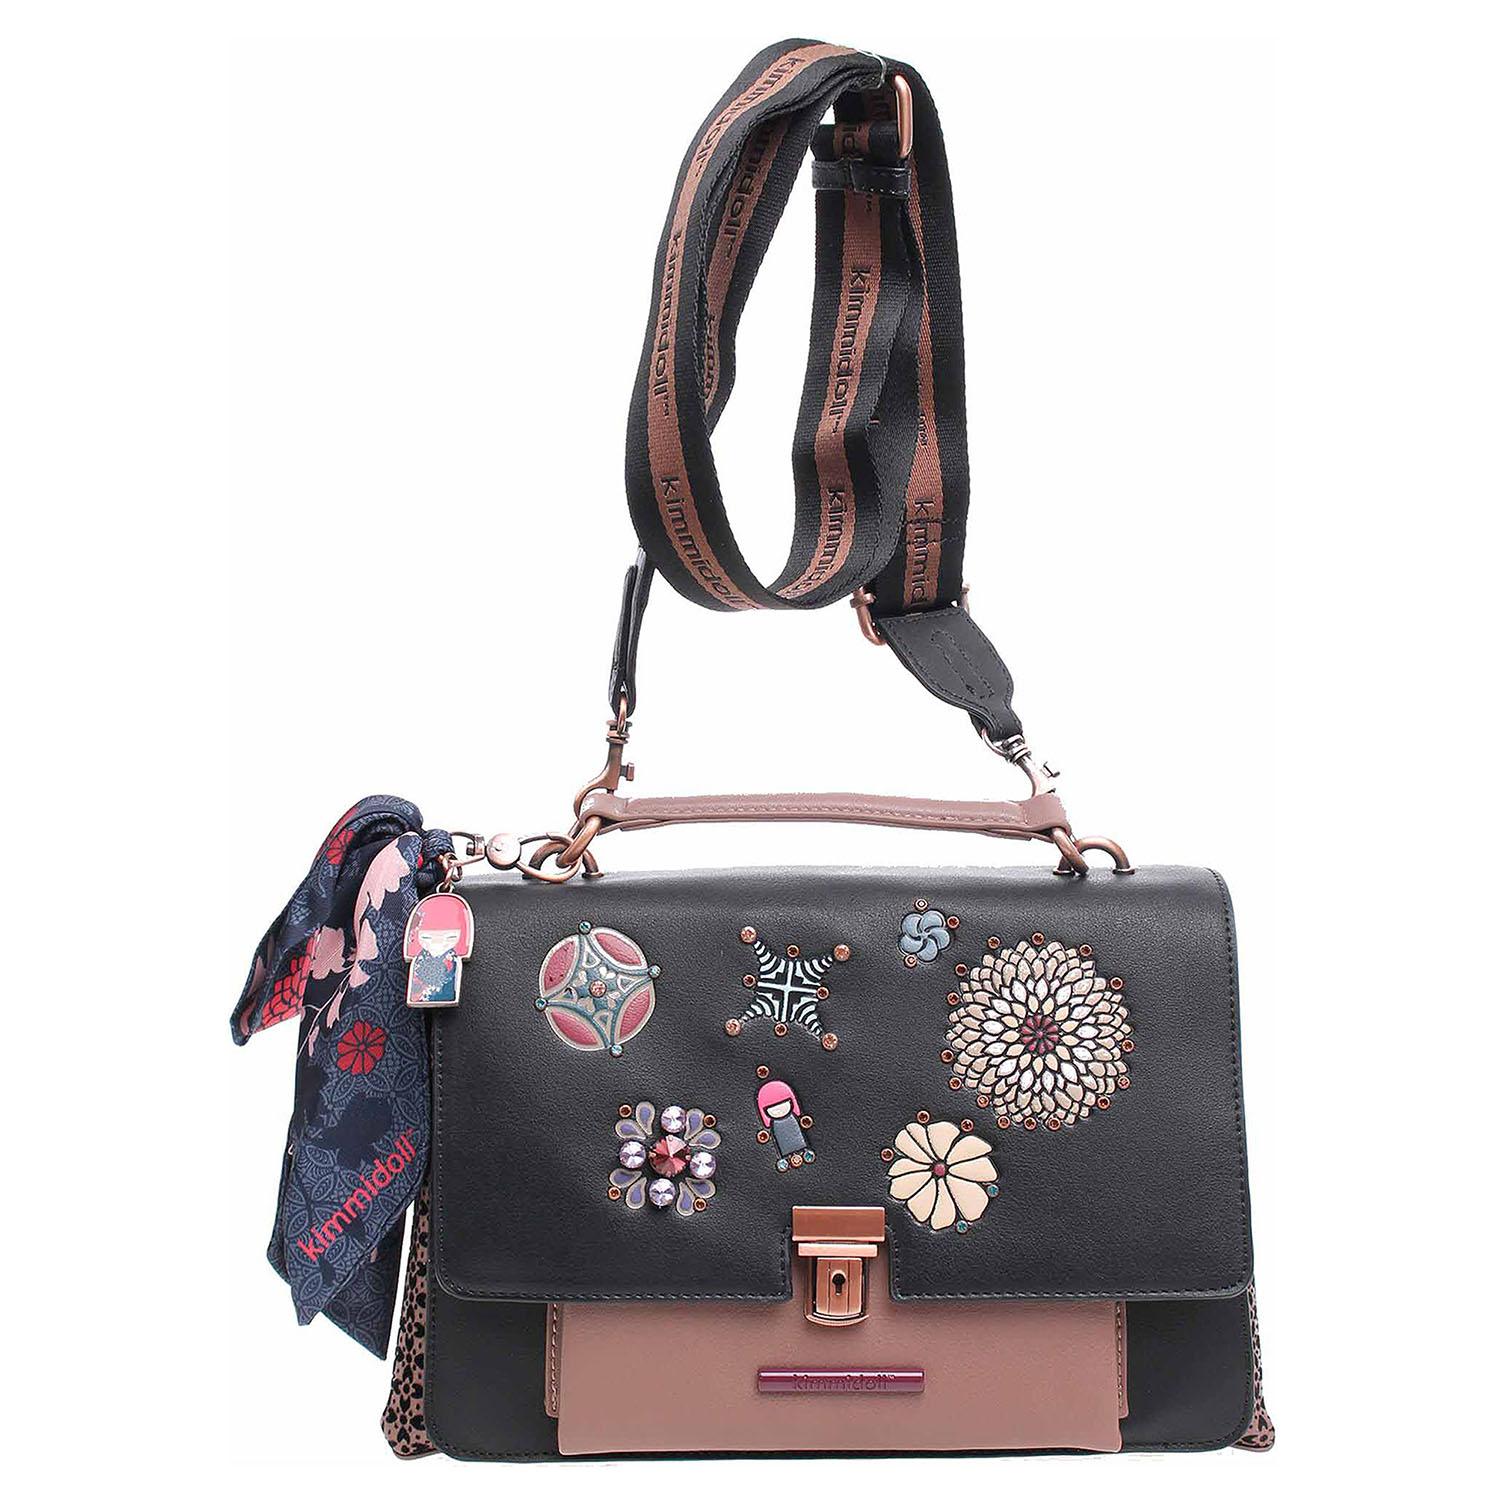 Kimmidoll dámská kabelka 29663-02 black 29663-02 black 1